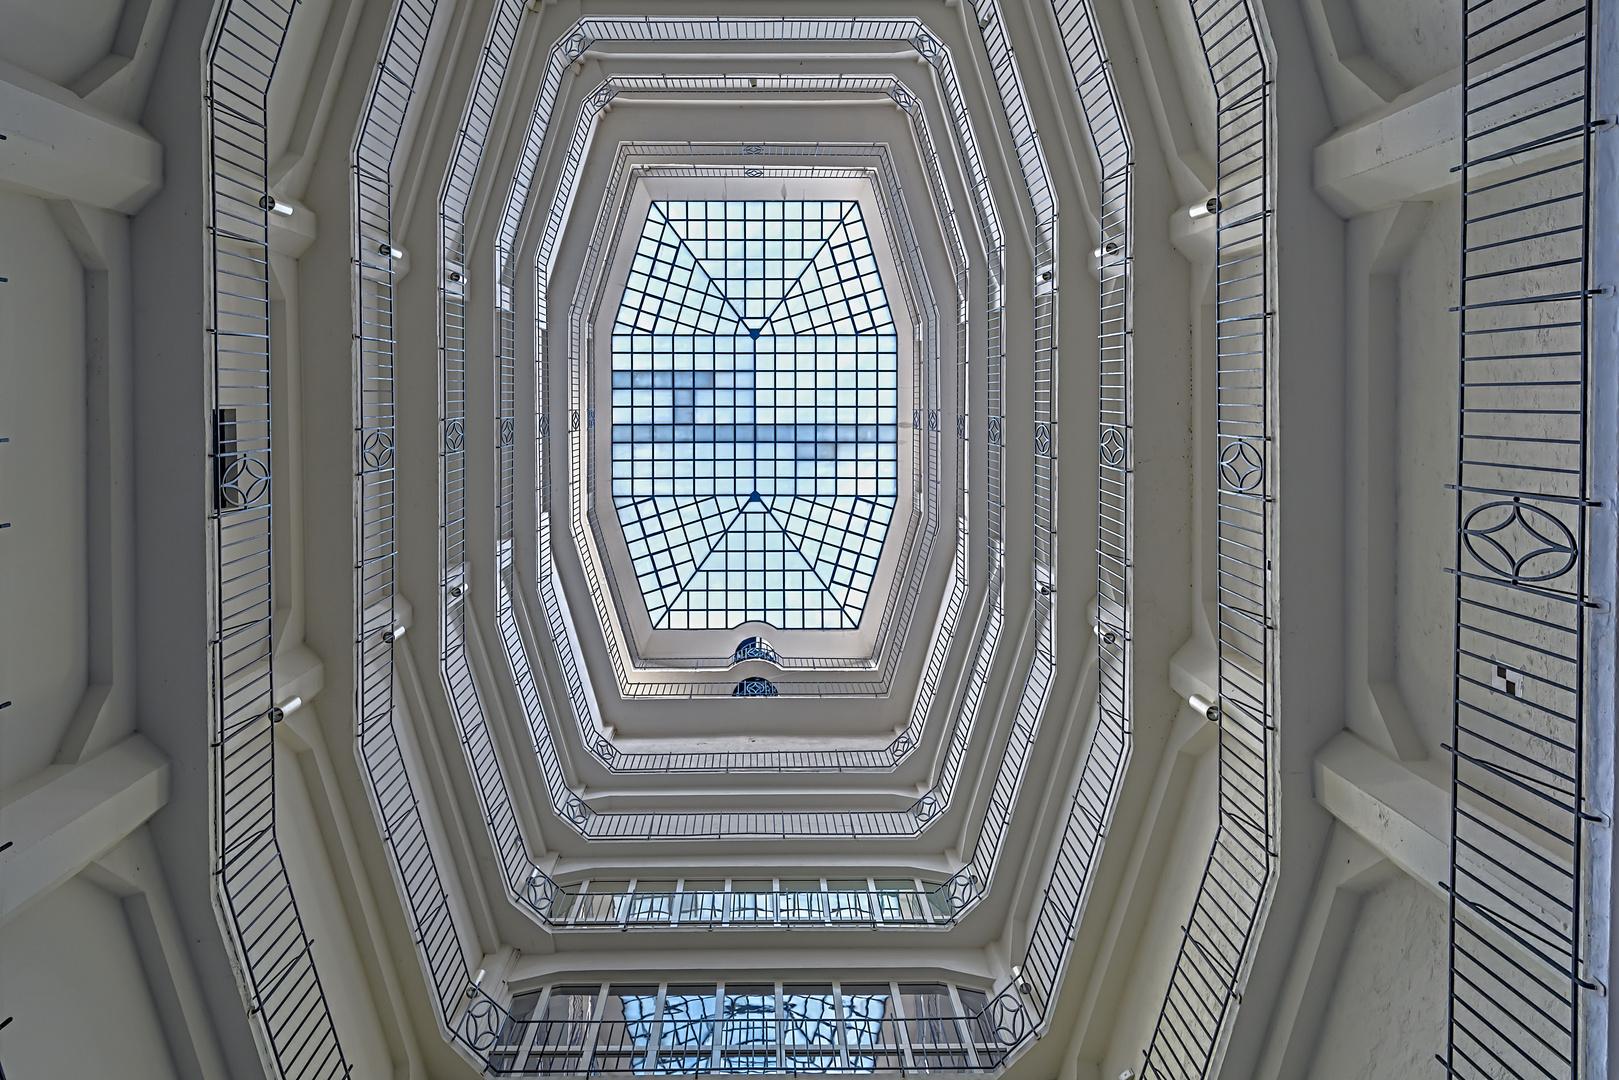 Hauptzollamt München, Kuppel